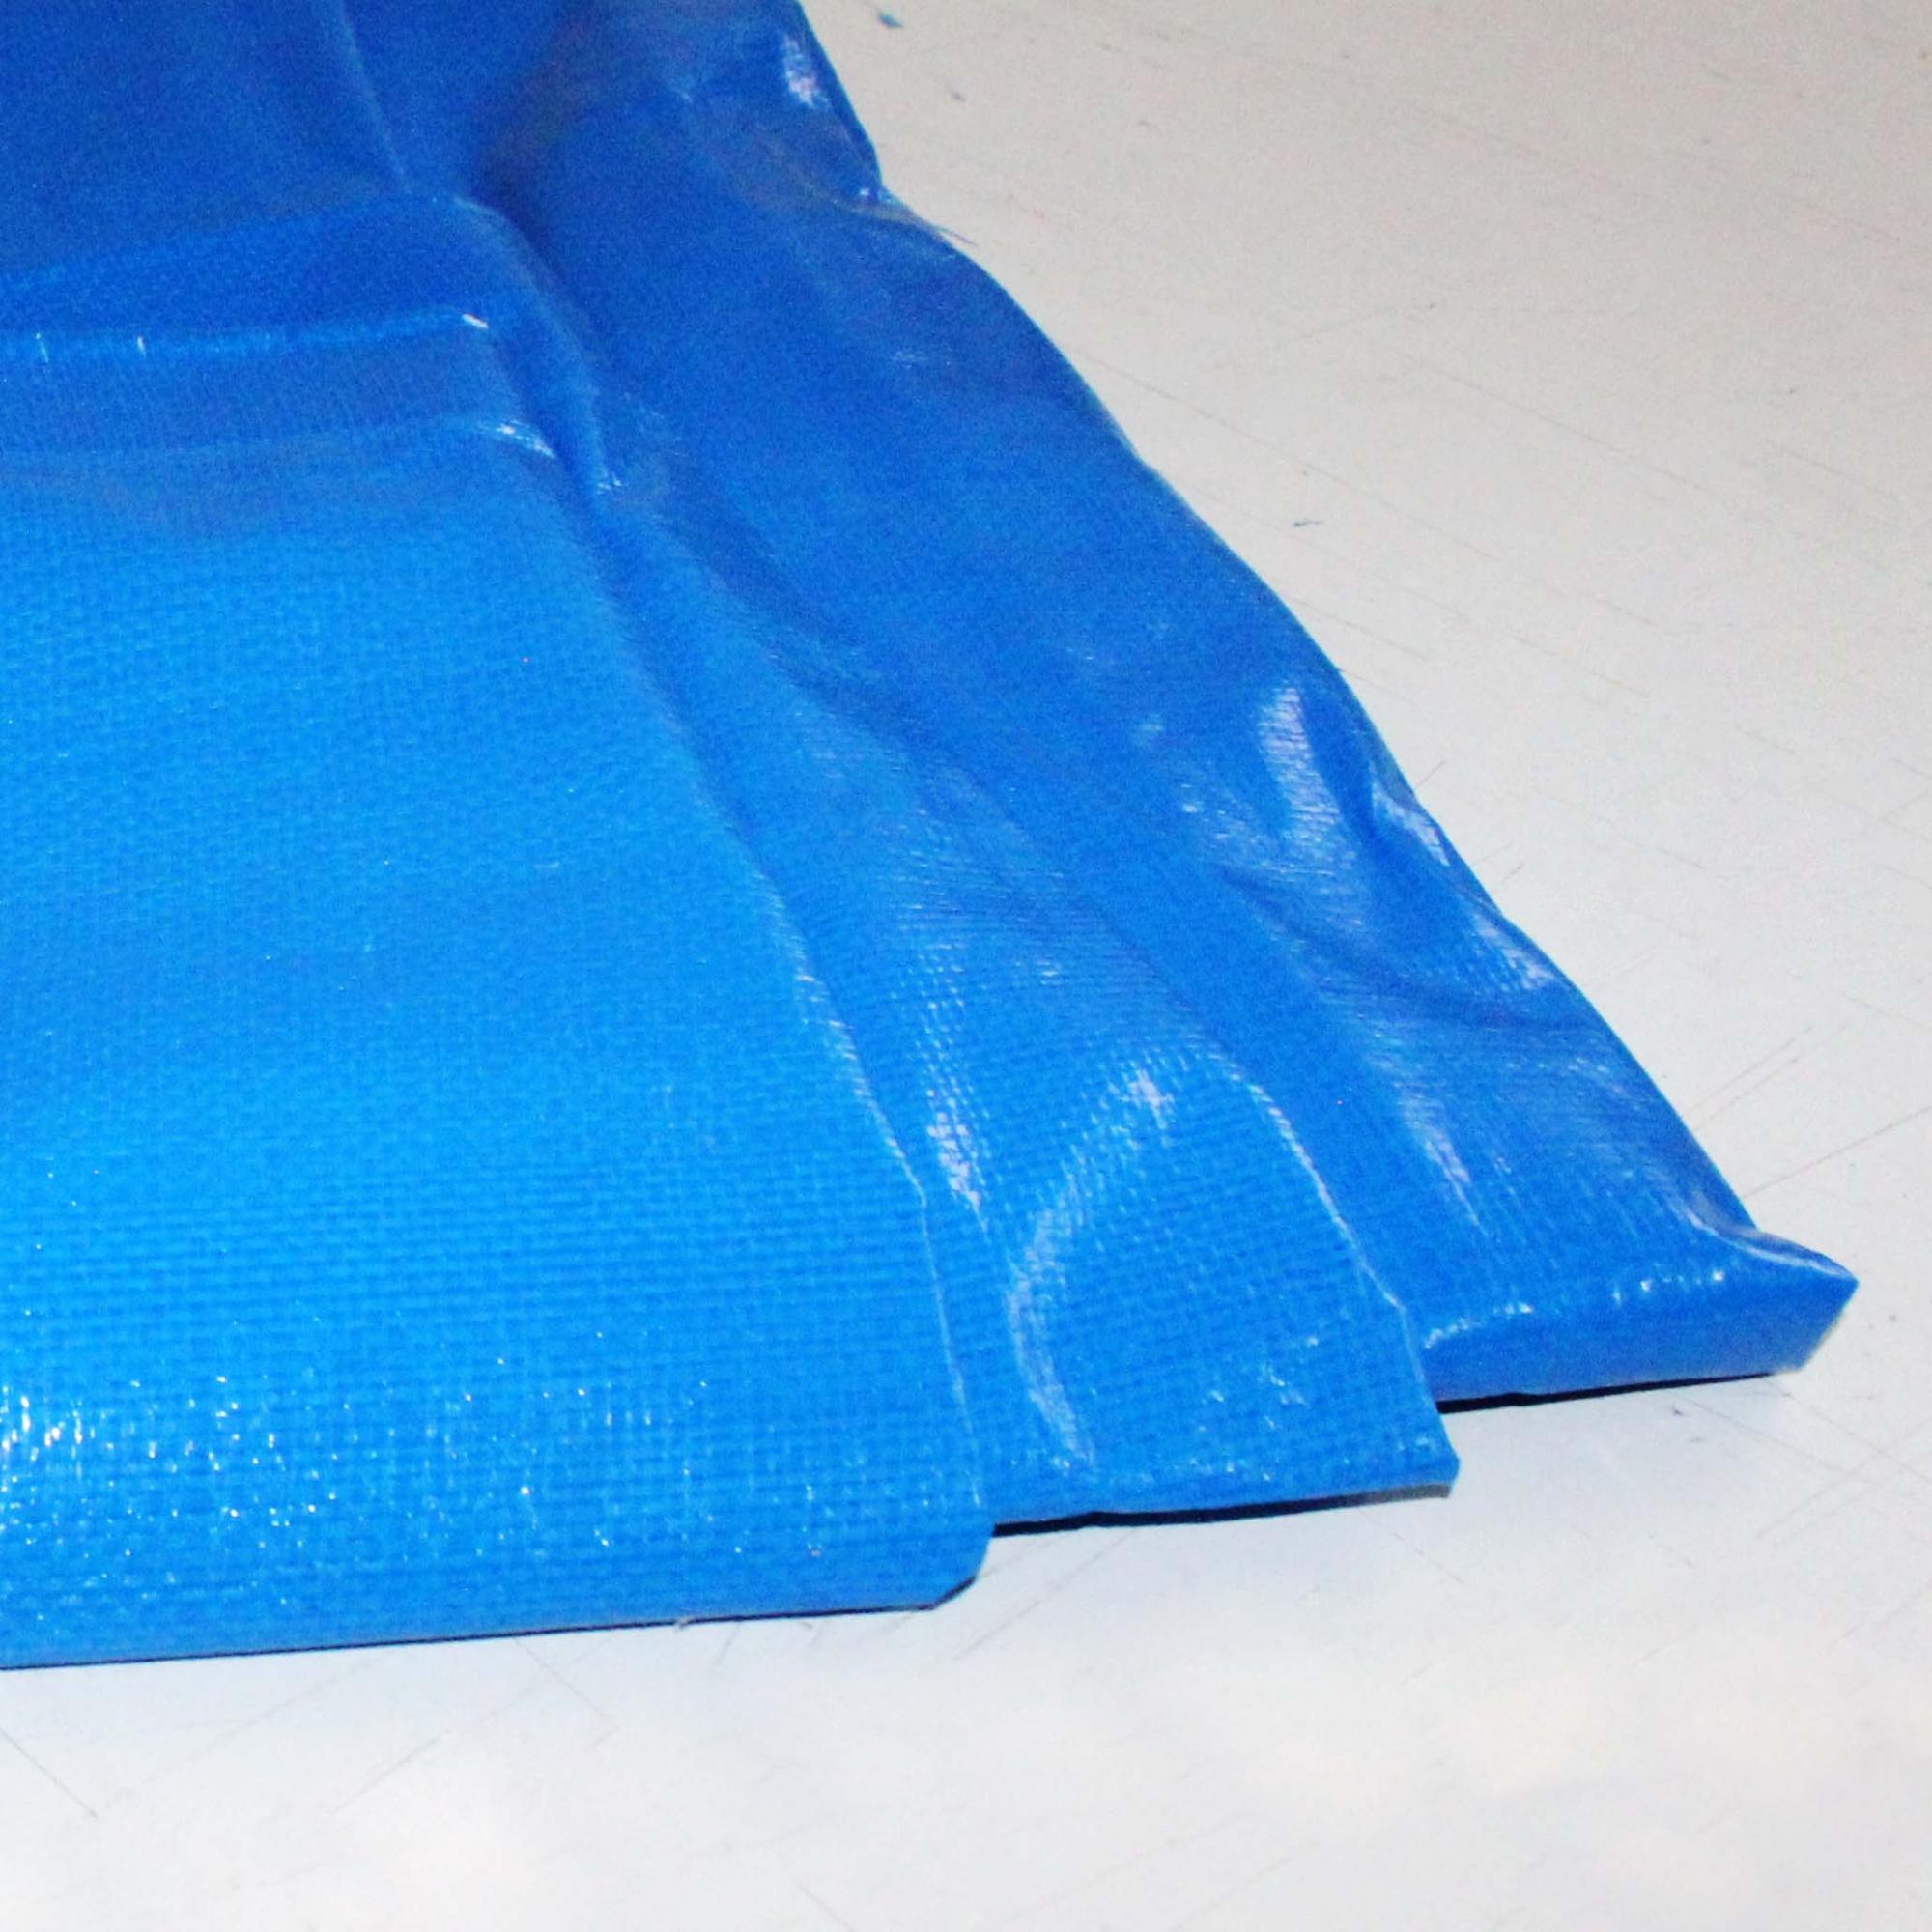 Prolona leve agric azul 3x6m